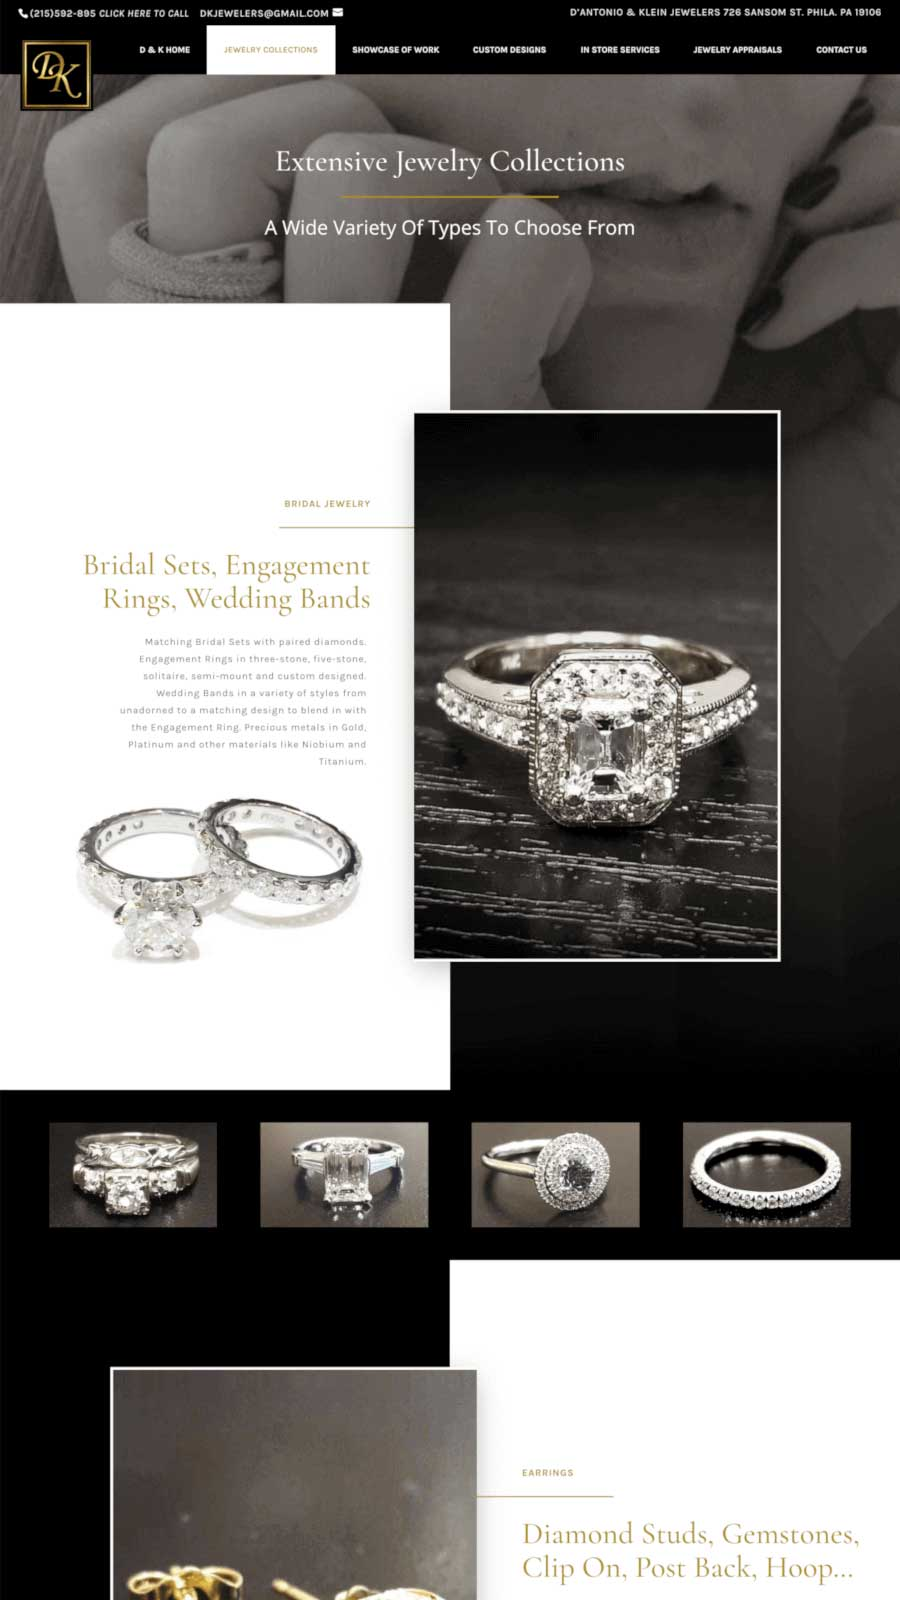 D'Antonio & Klein Jewelry Collections